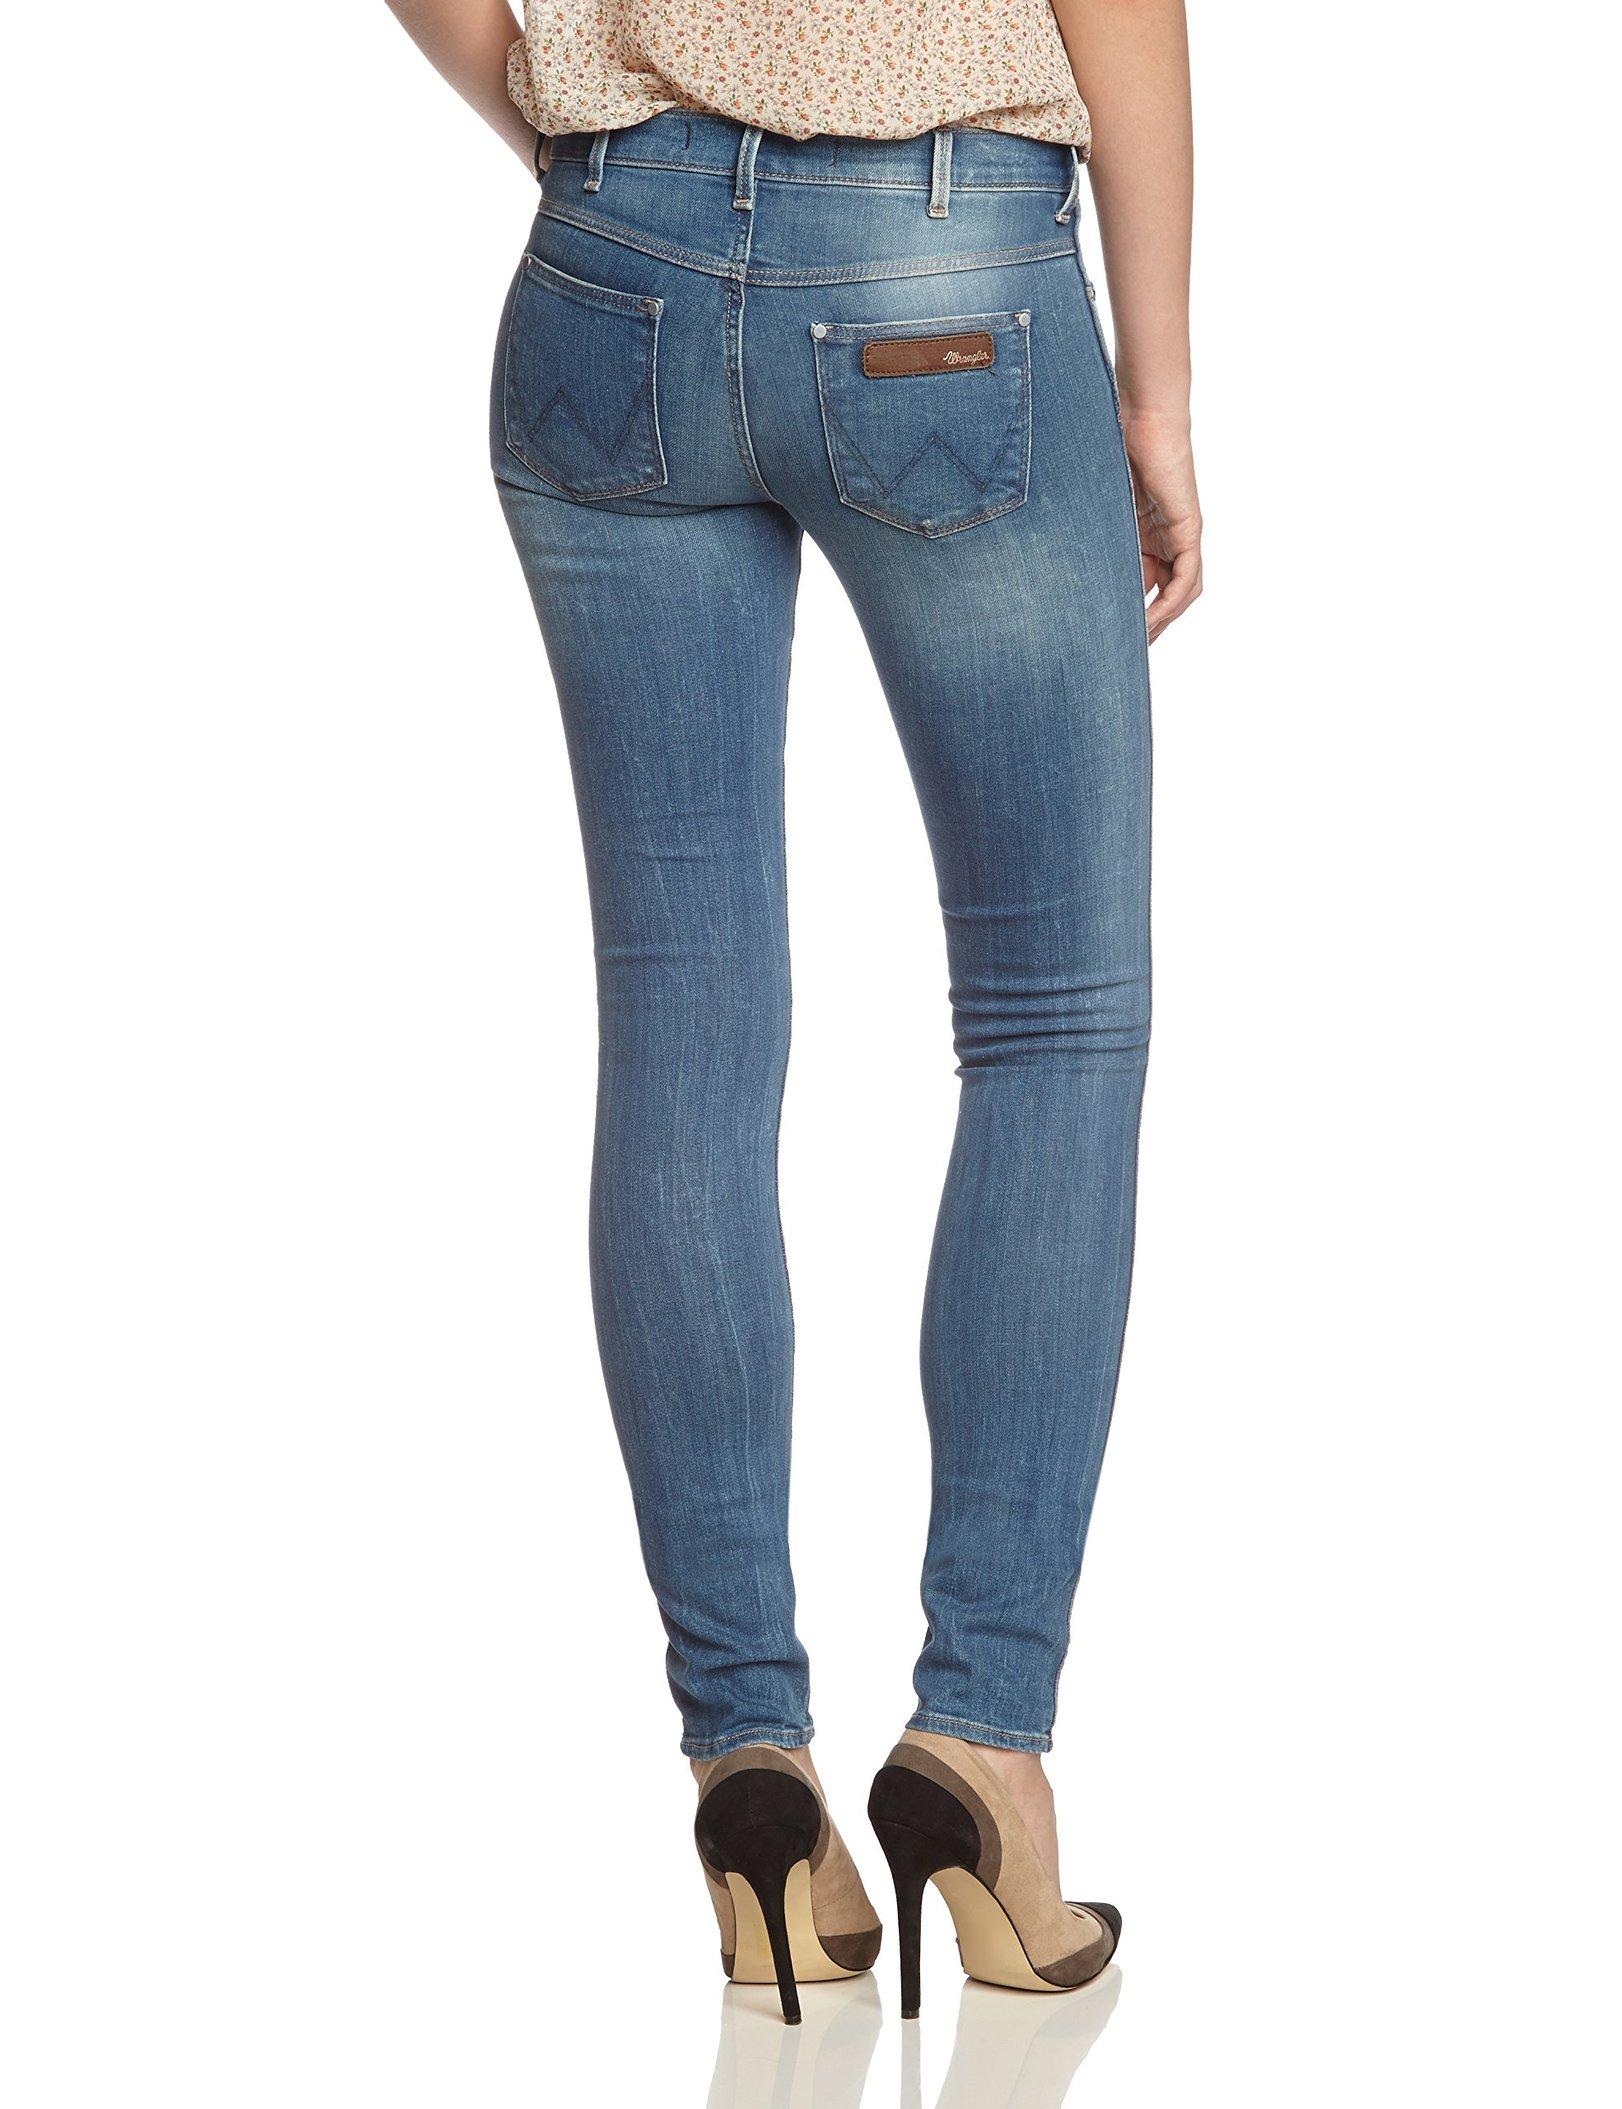 Levi Womens Jeans Size Chart